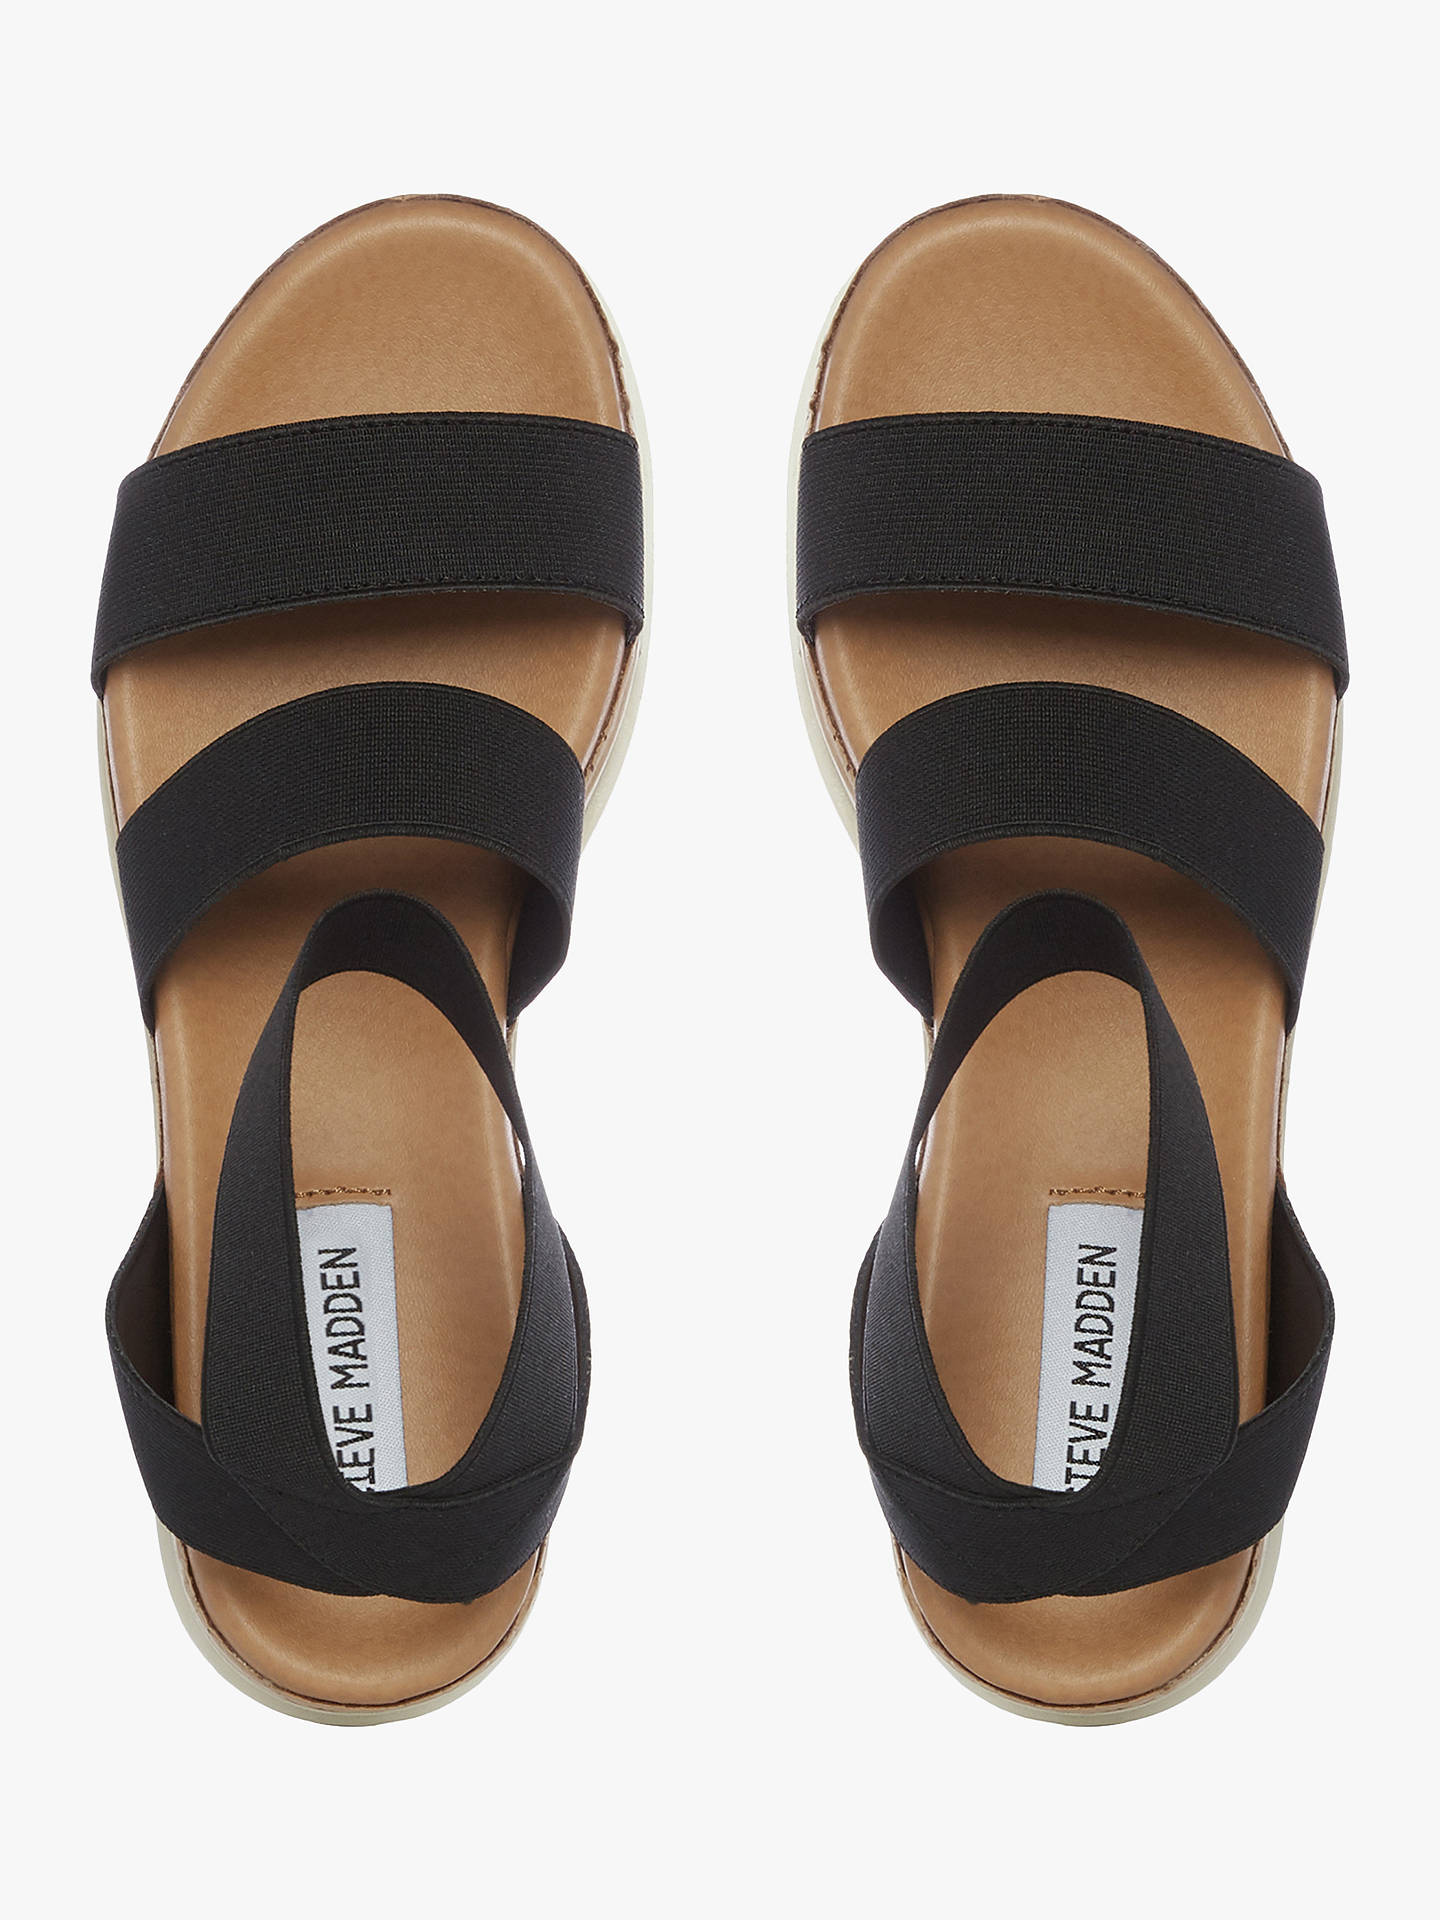 4f028587ccb Steve Madden Bandi Flatform Sandals at John Lewis   Partners